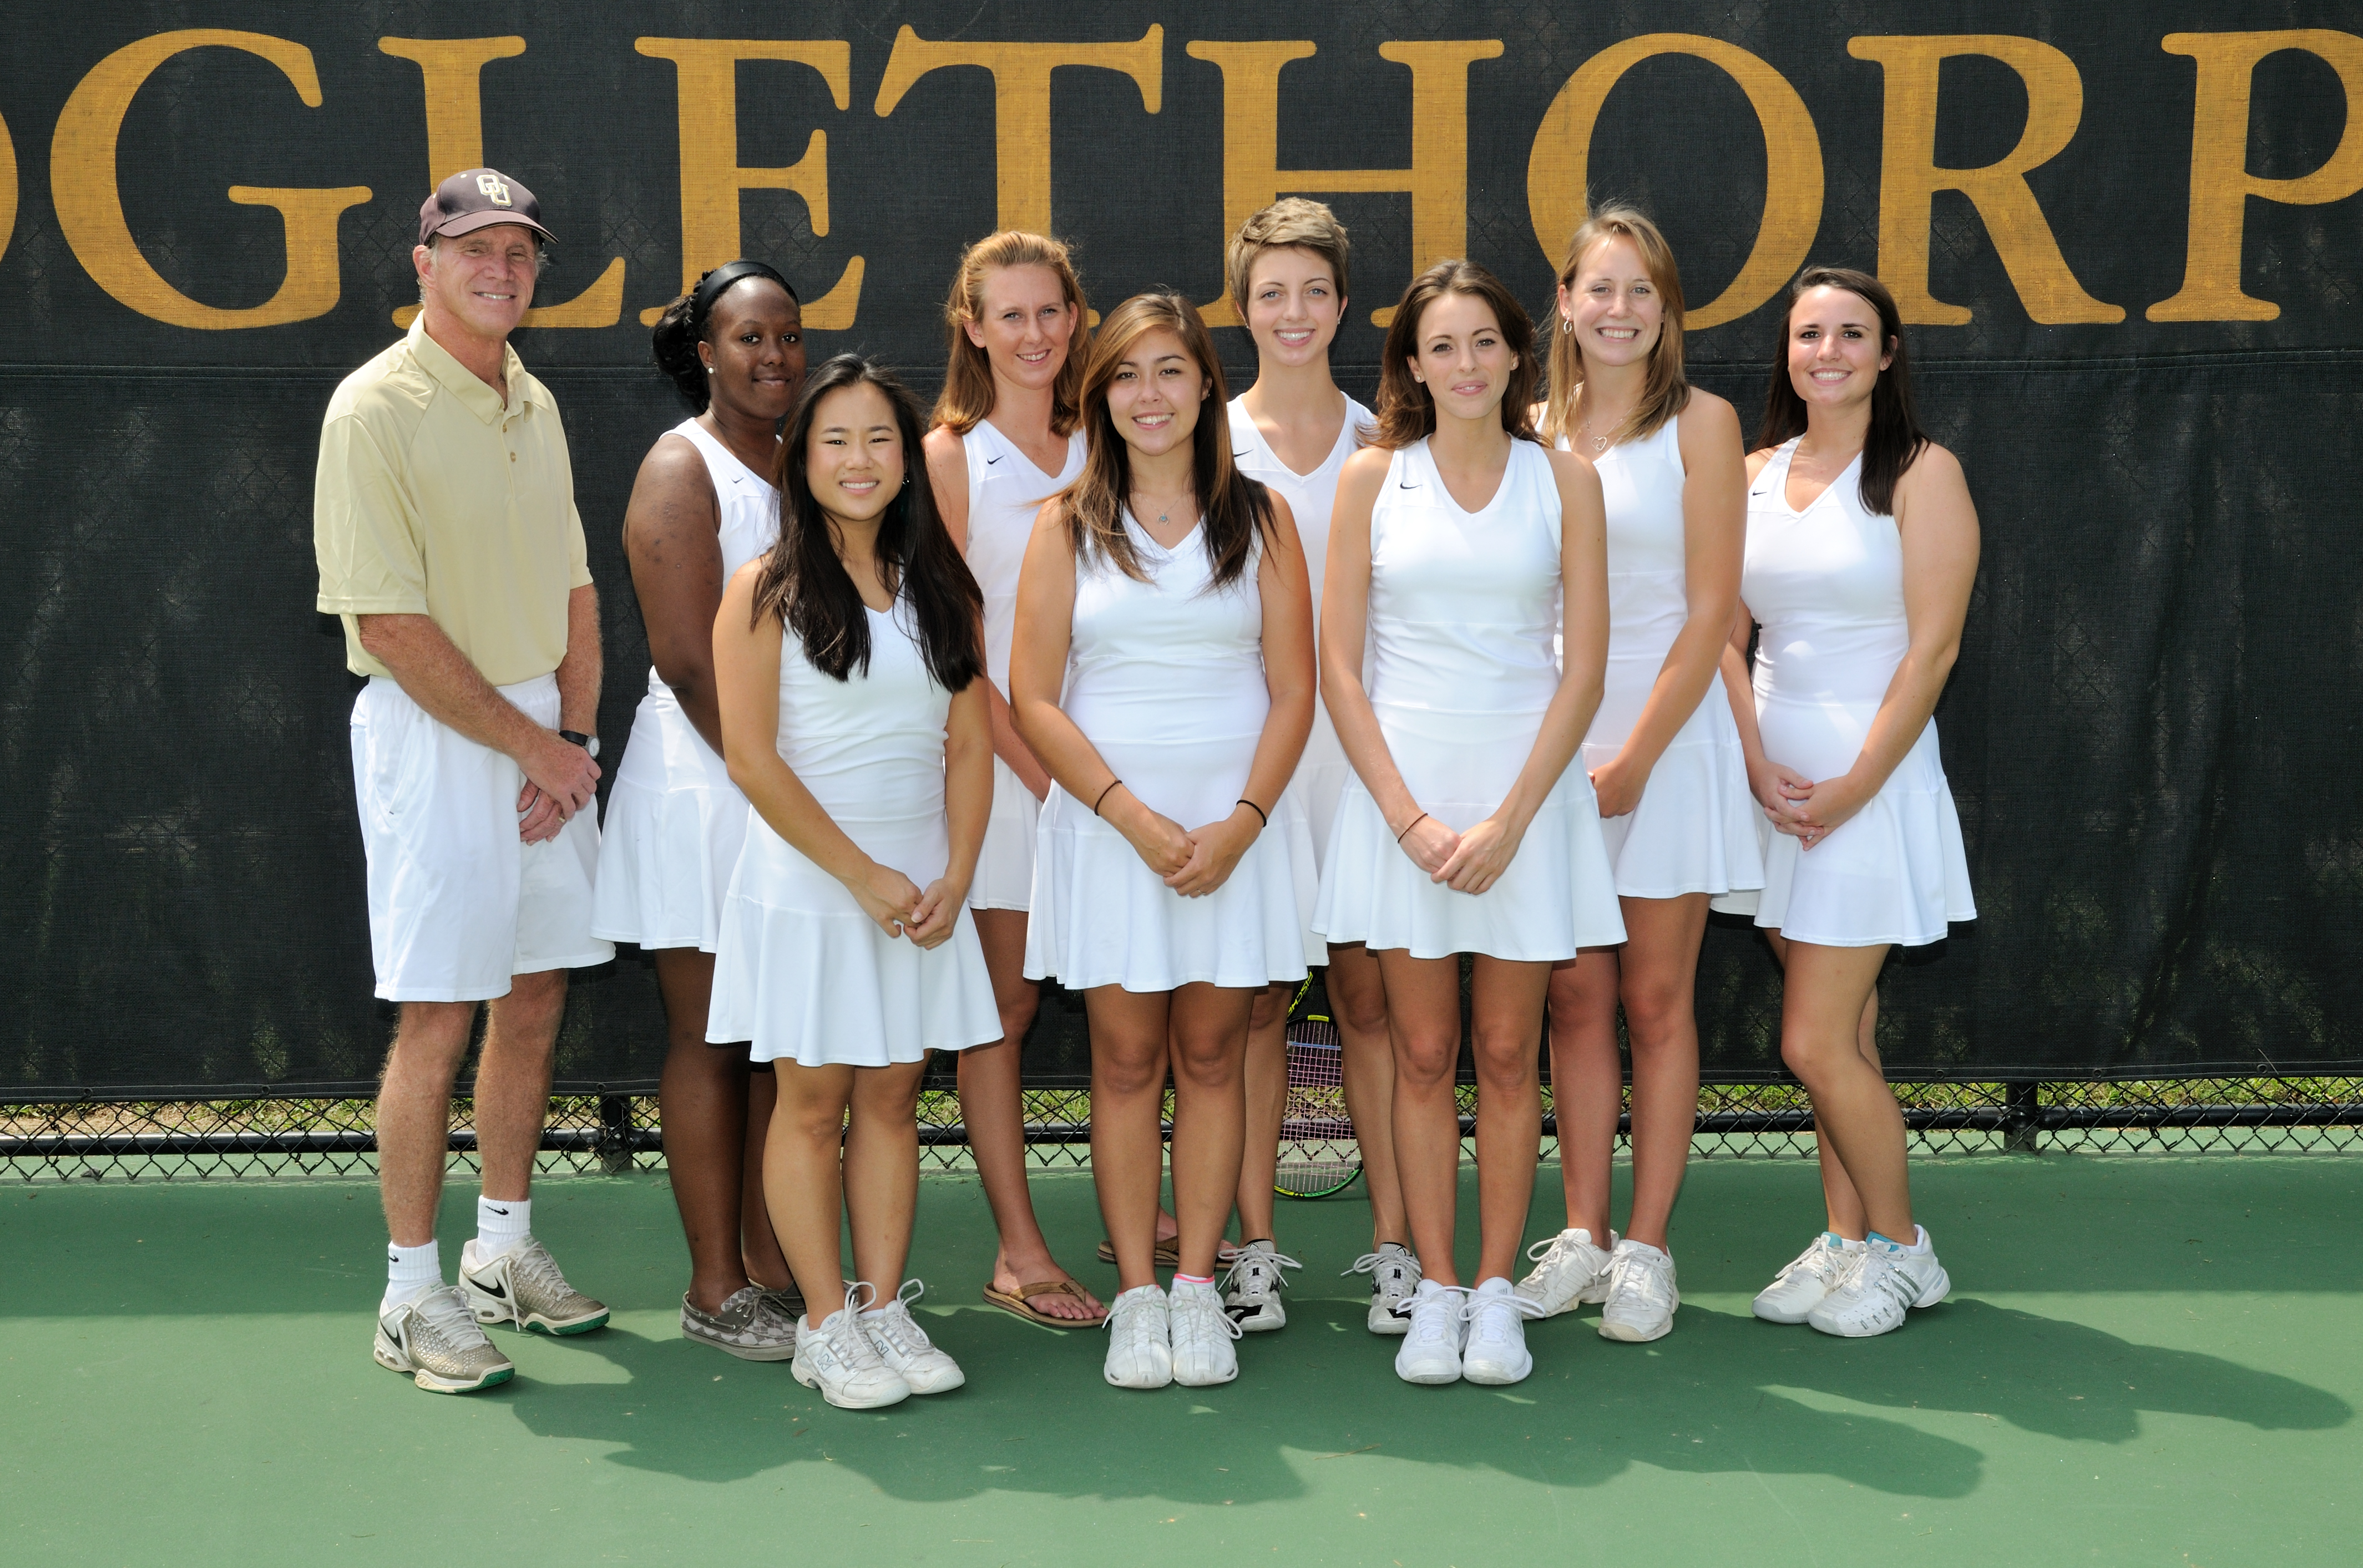 Latvian Women Tennis Team 71